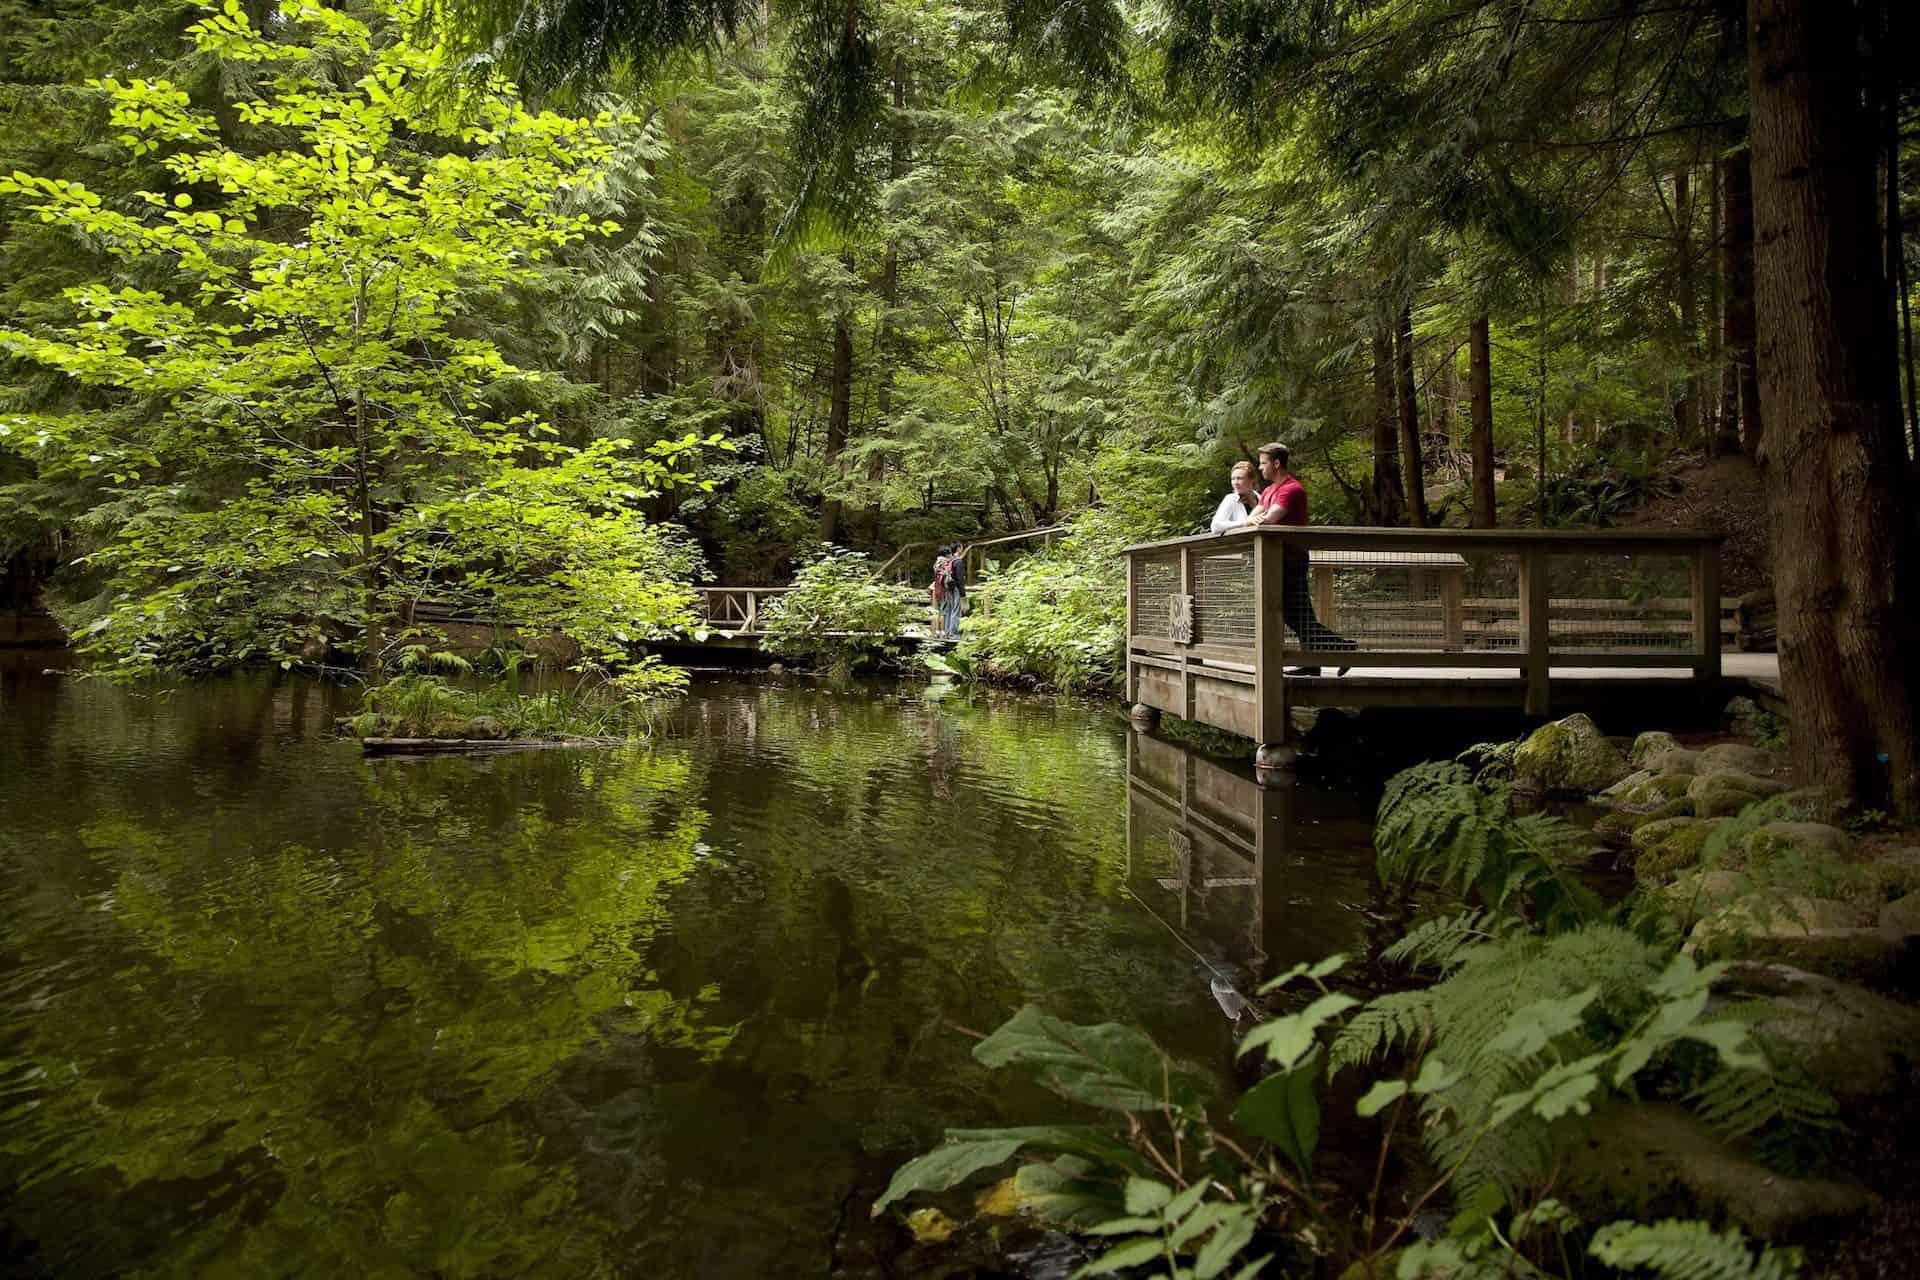 Coming Attractions >> Capilano Suspension Bridge Park - WESTCOAST Sightseeing